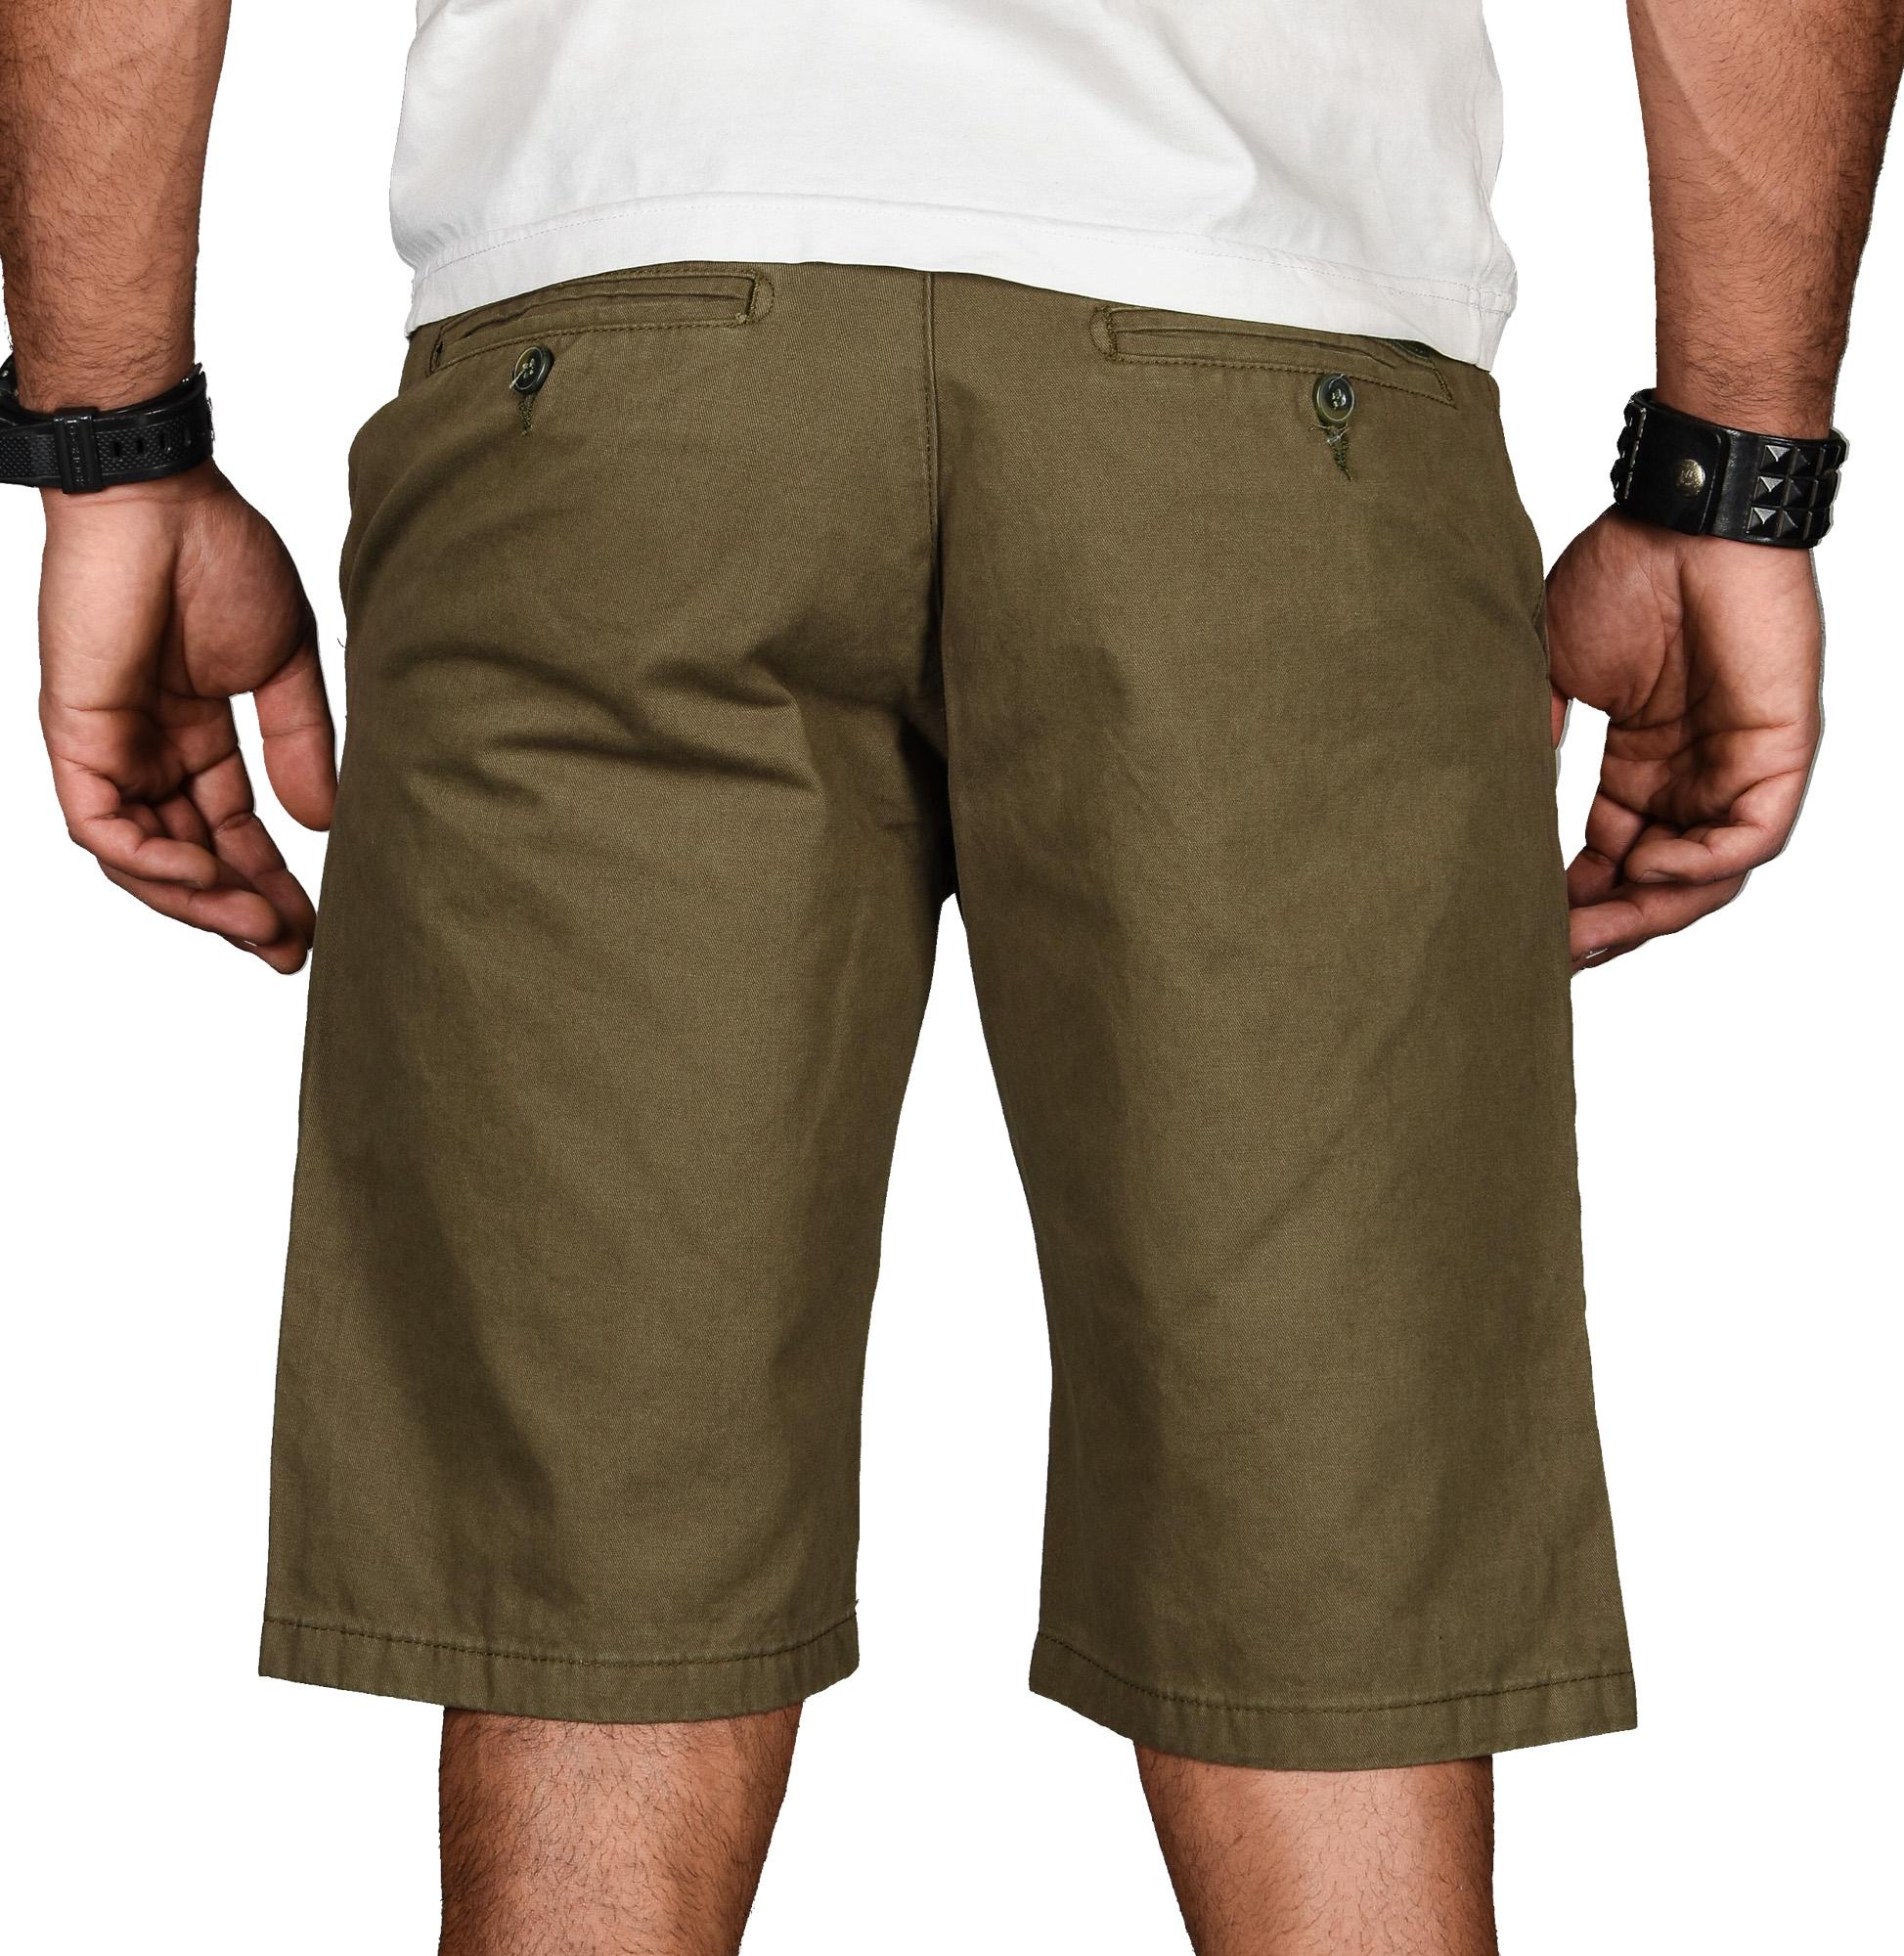 A-Salvarini-Herren-Shorts-kurze-Sommer-Hose-mit-Guertel-Short-Bermuda-NEU-AS096 Indexbild 31